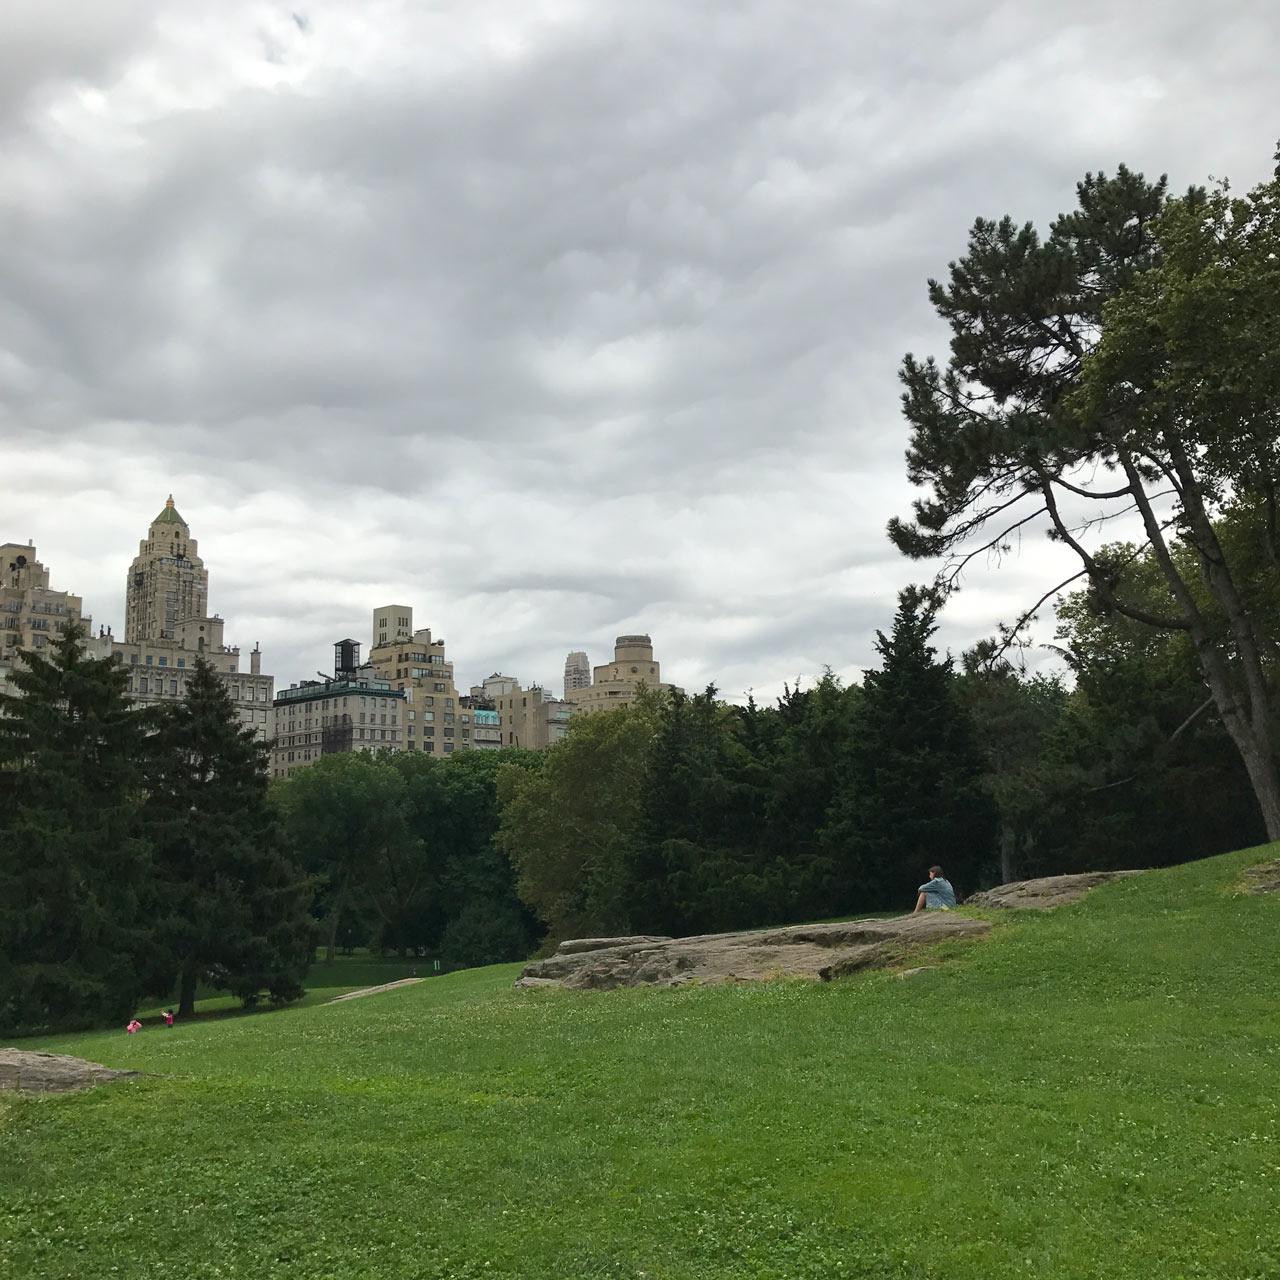 Central-Park-Olmsted-KMDG-NY-1.jpg